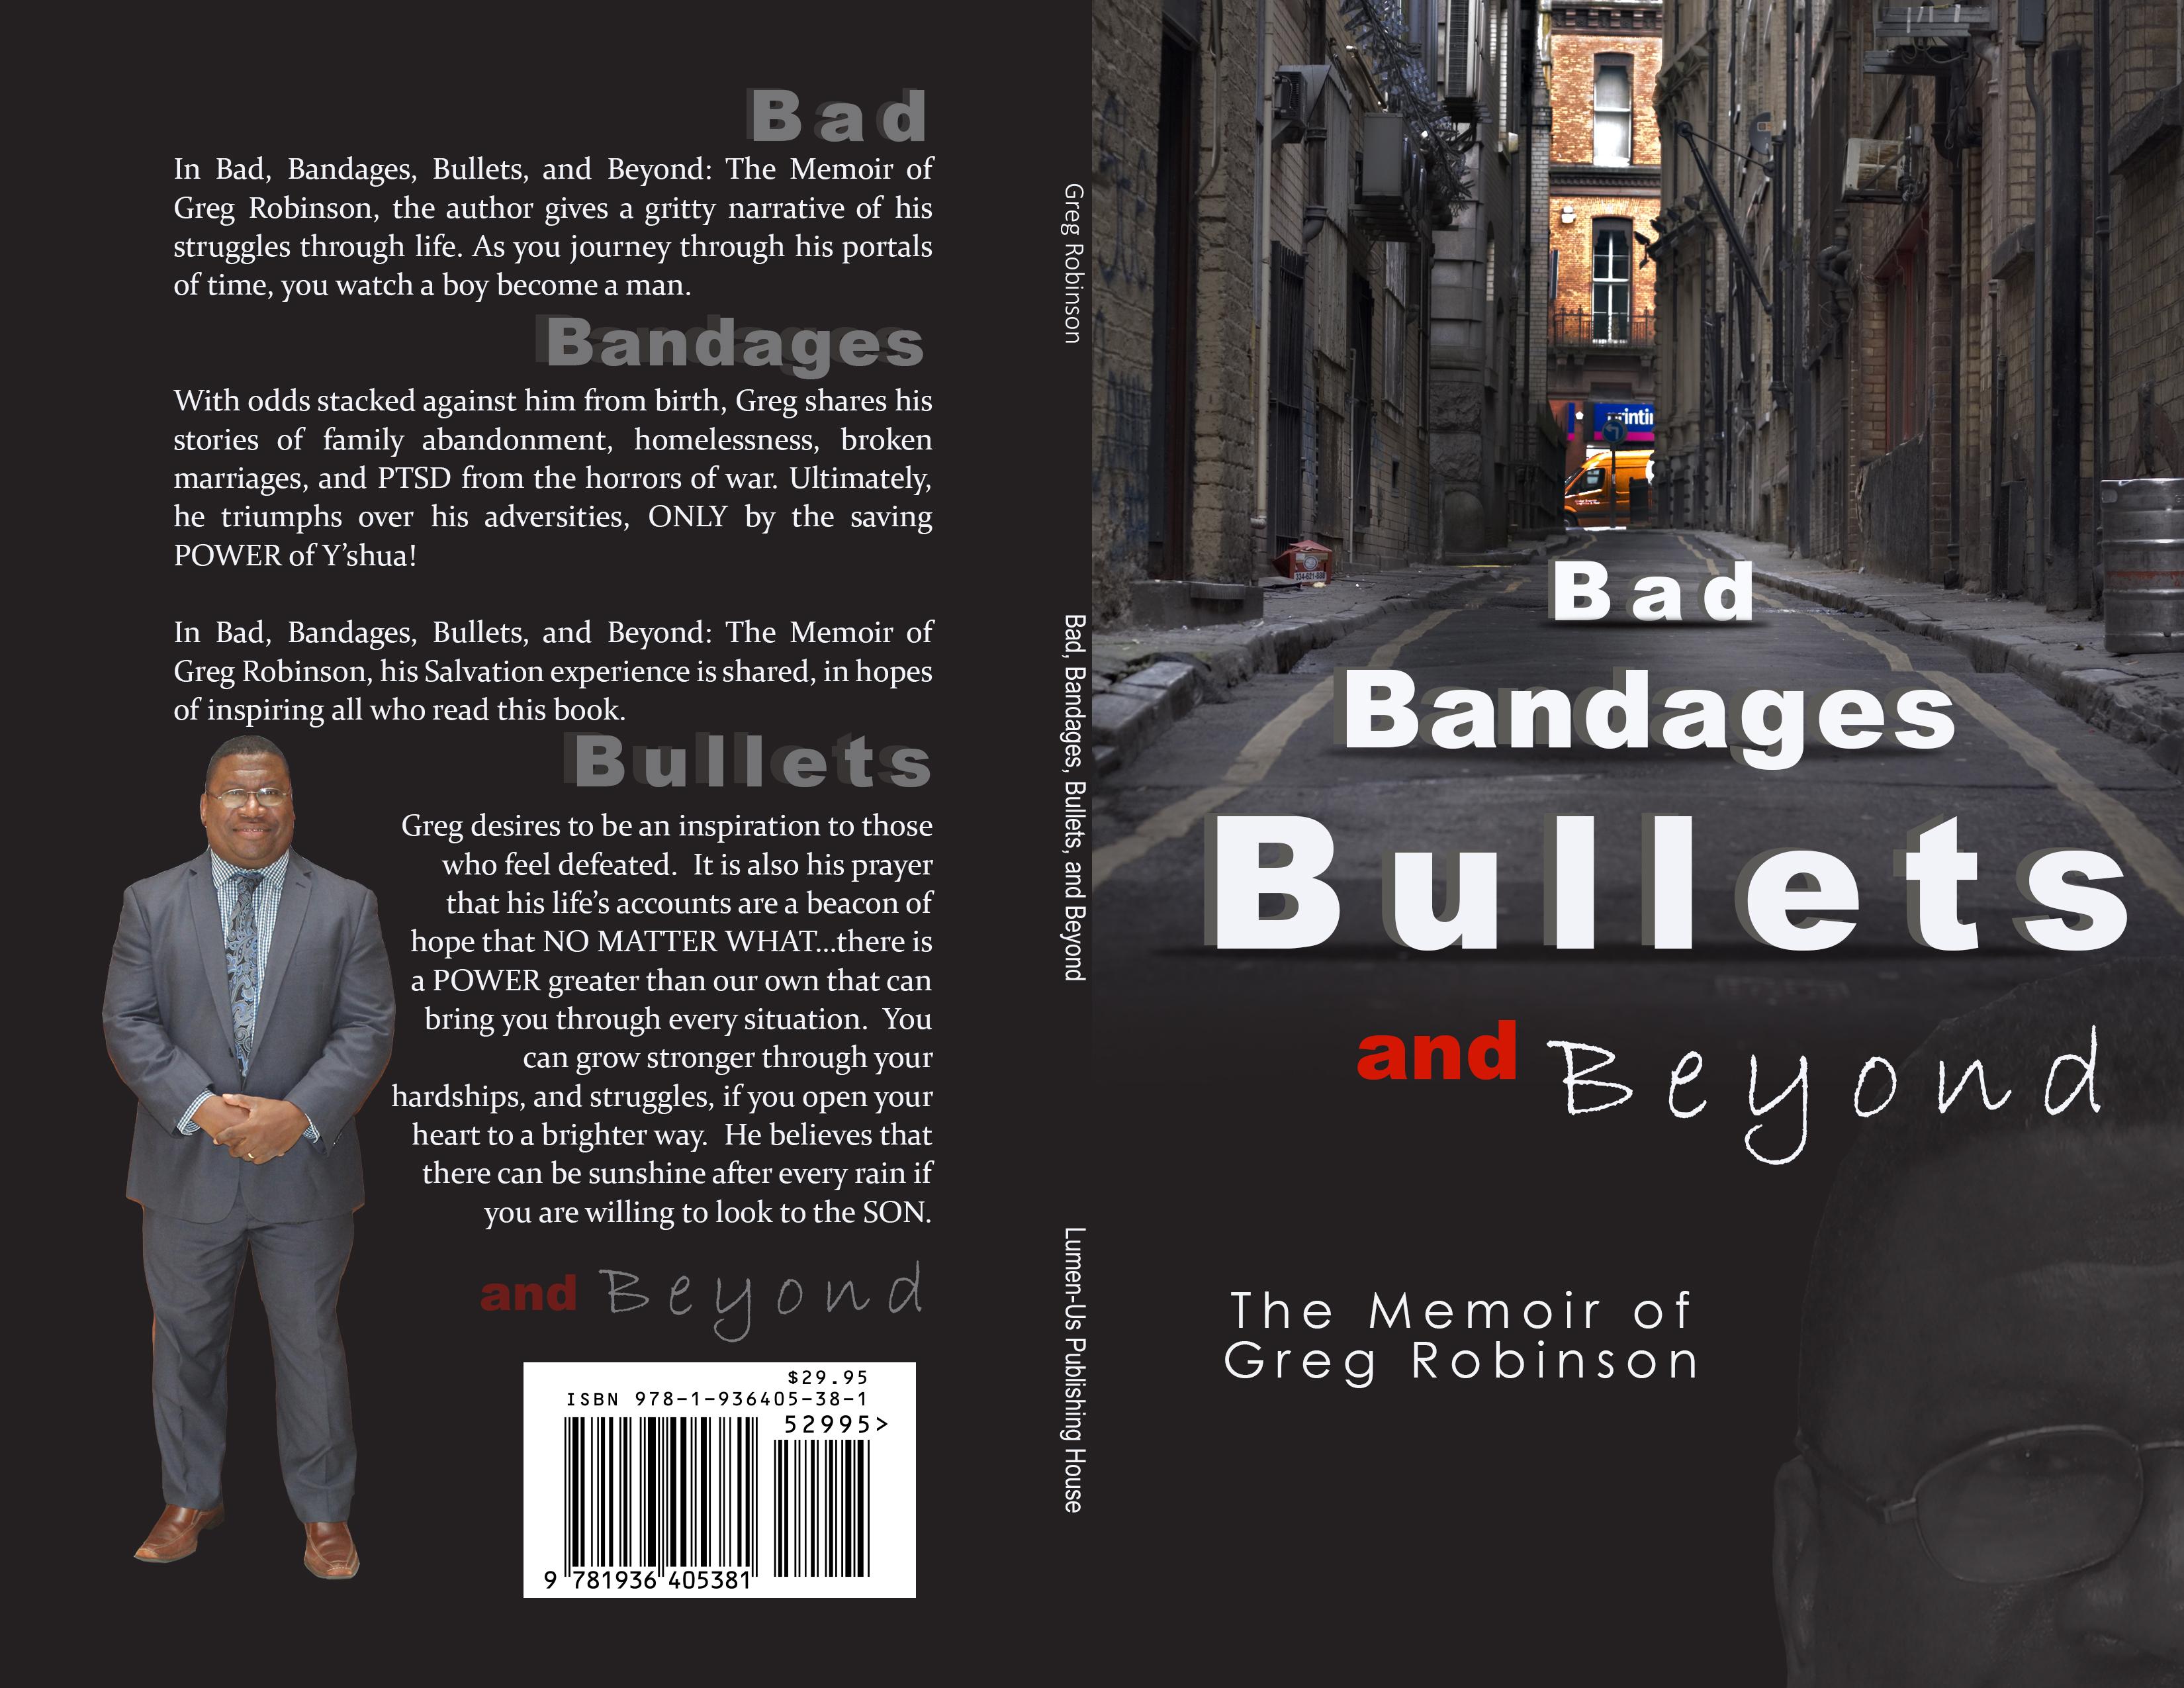 BAD, BANDAGES, BULLETS AND BEYOND: THE MEMOIR OF GREG ROBINSON